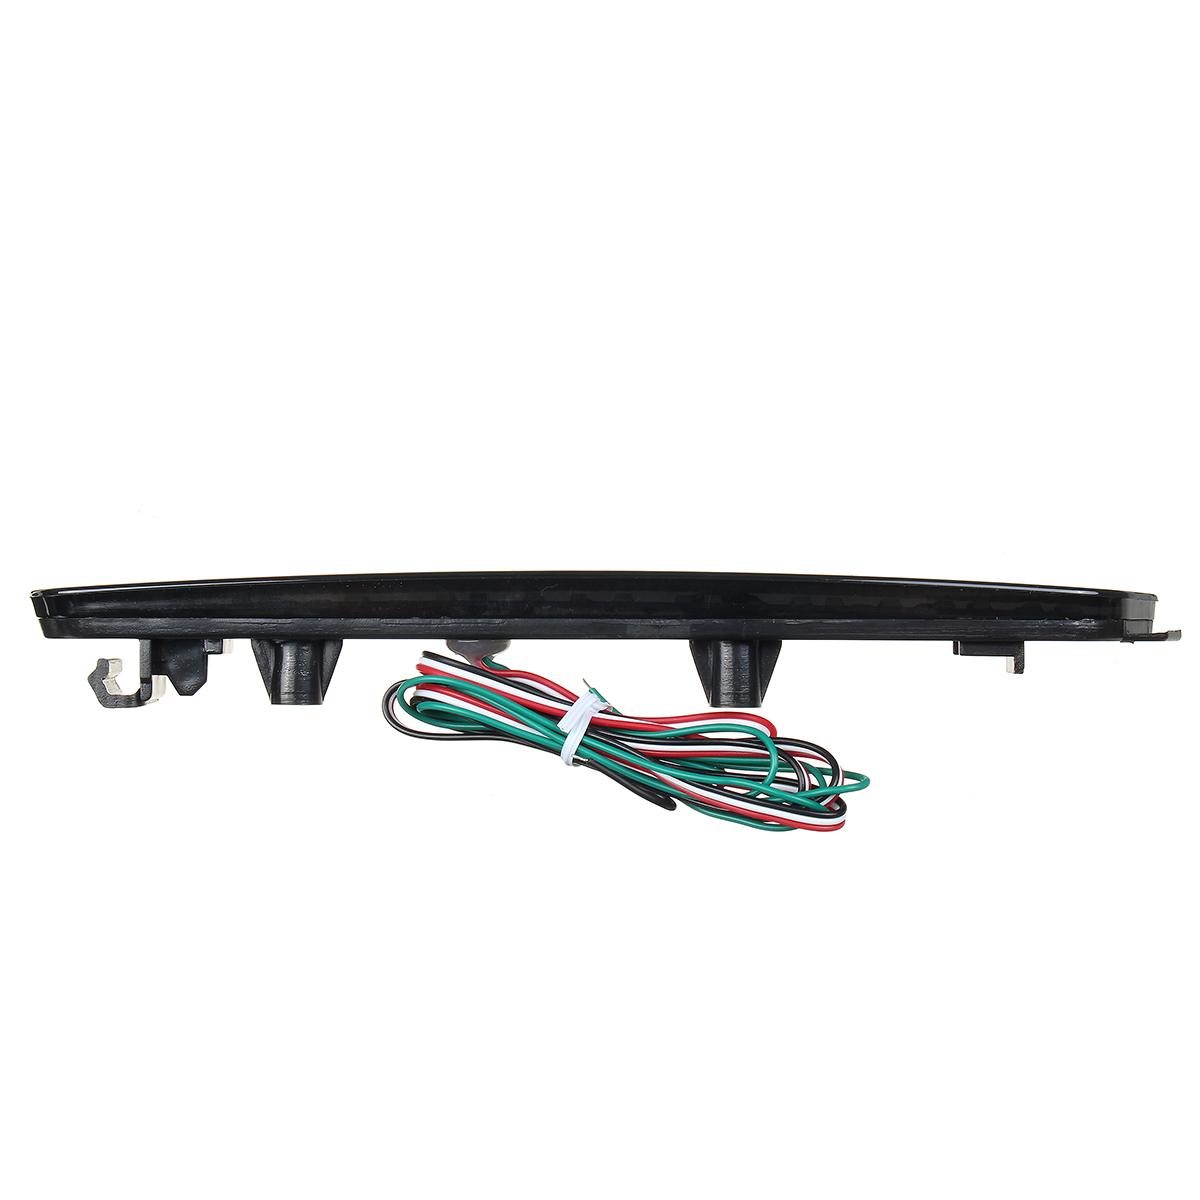 Dynamic Flowing LED Car Rear Bumper Tail Lights Brake Fog Lamp For Mazda 2 3 6 8 Atenza Axela